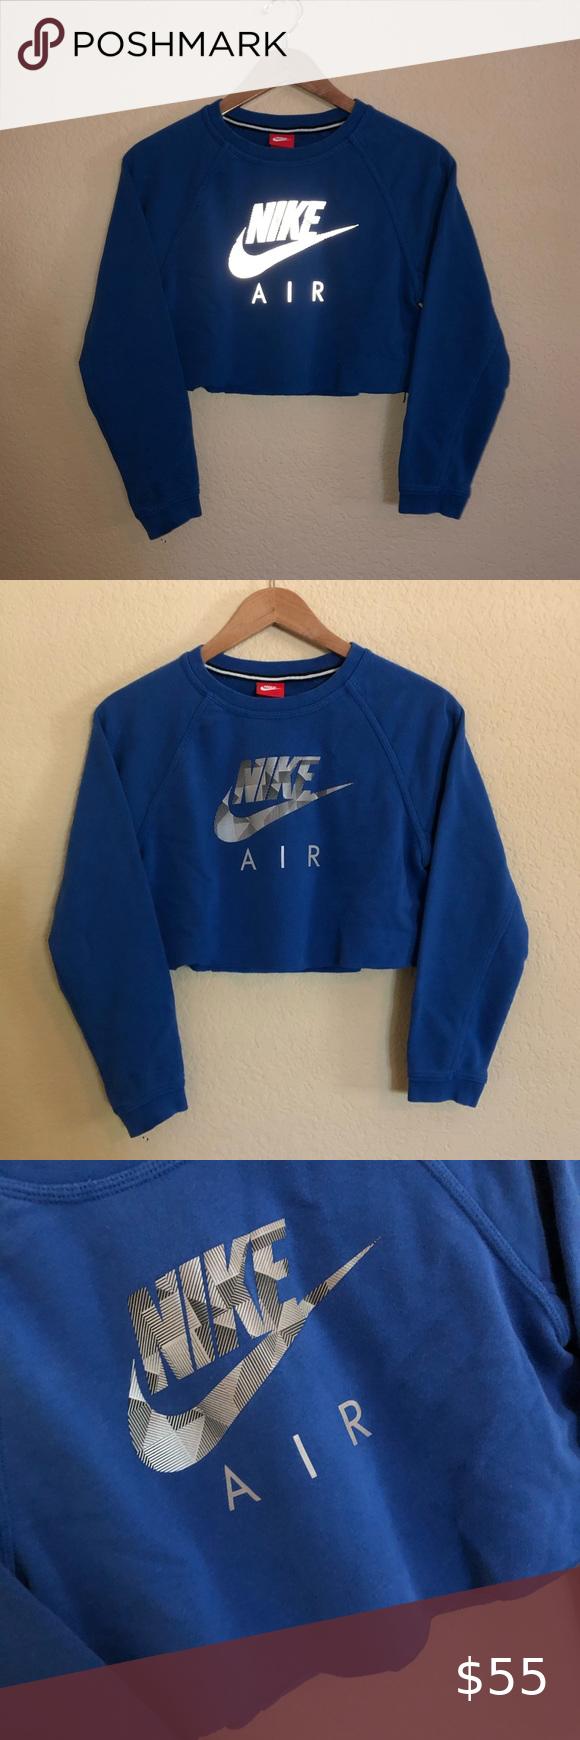 Nike Air Reflective Crop Top Sweatshirt Crop Top Sweatshirt Sweatshirt Tops Sweatshirts [ 1740 x 580 Pixel ]